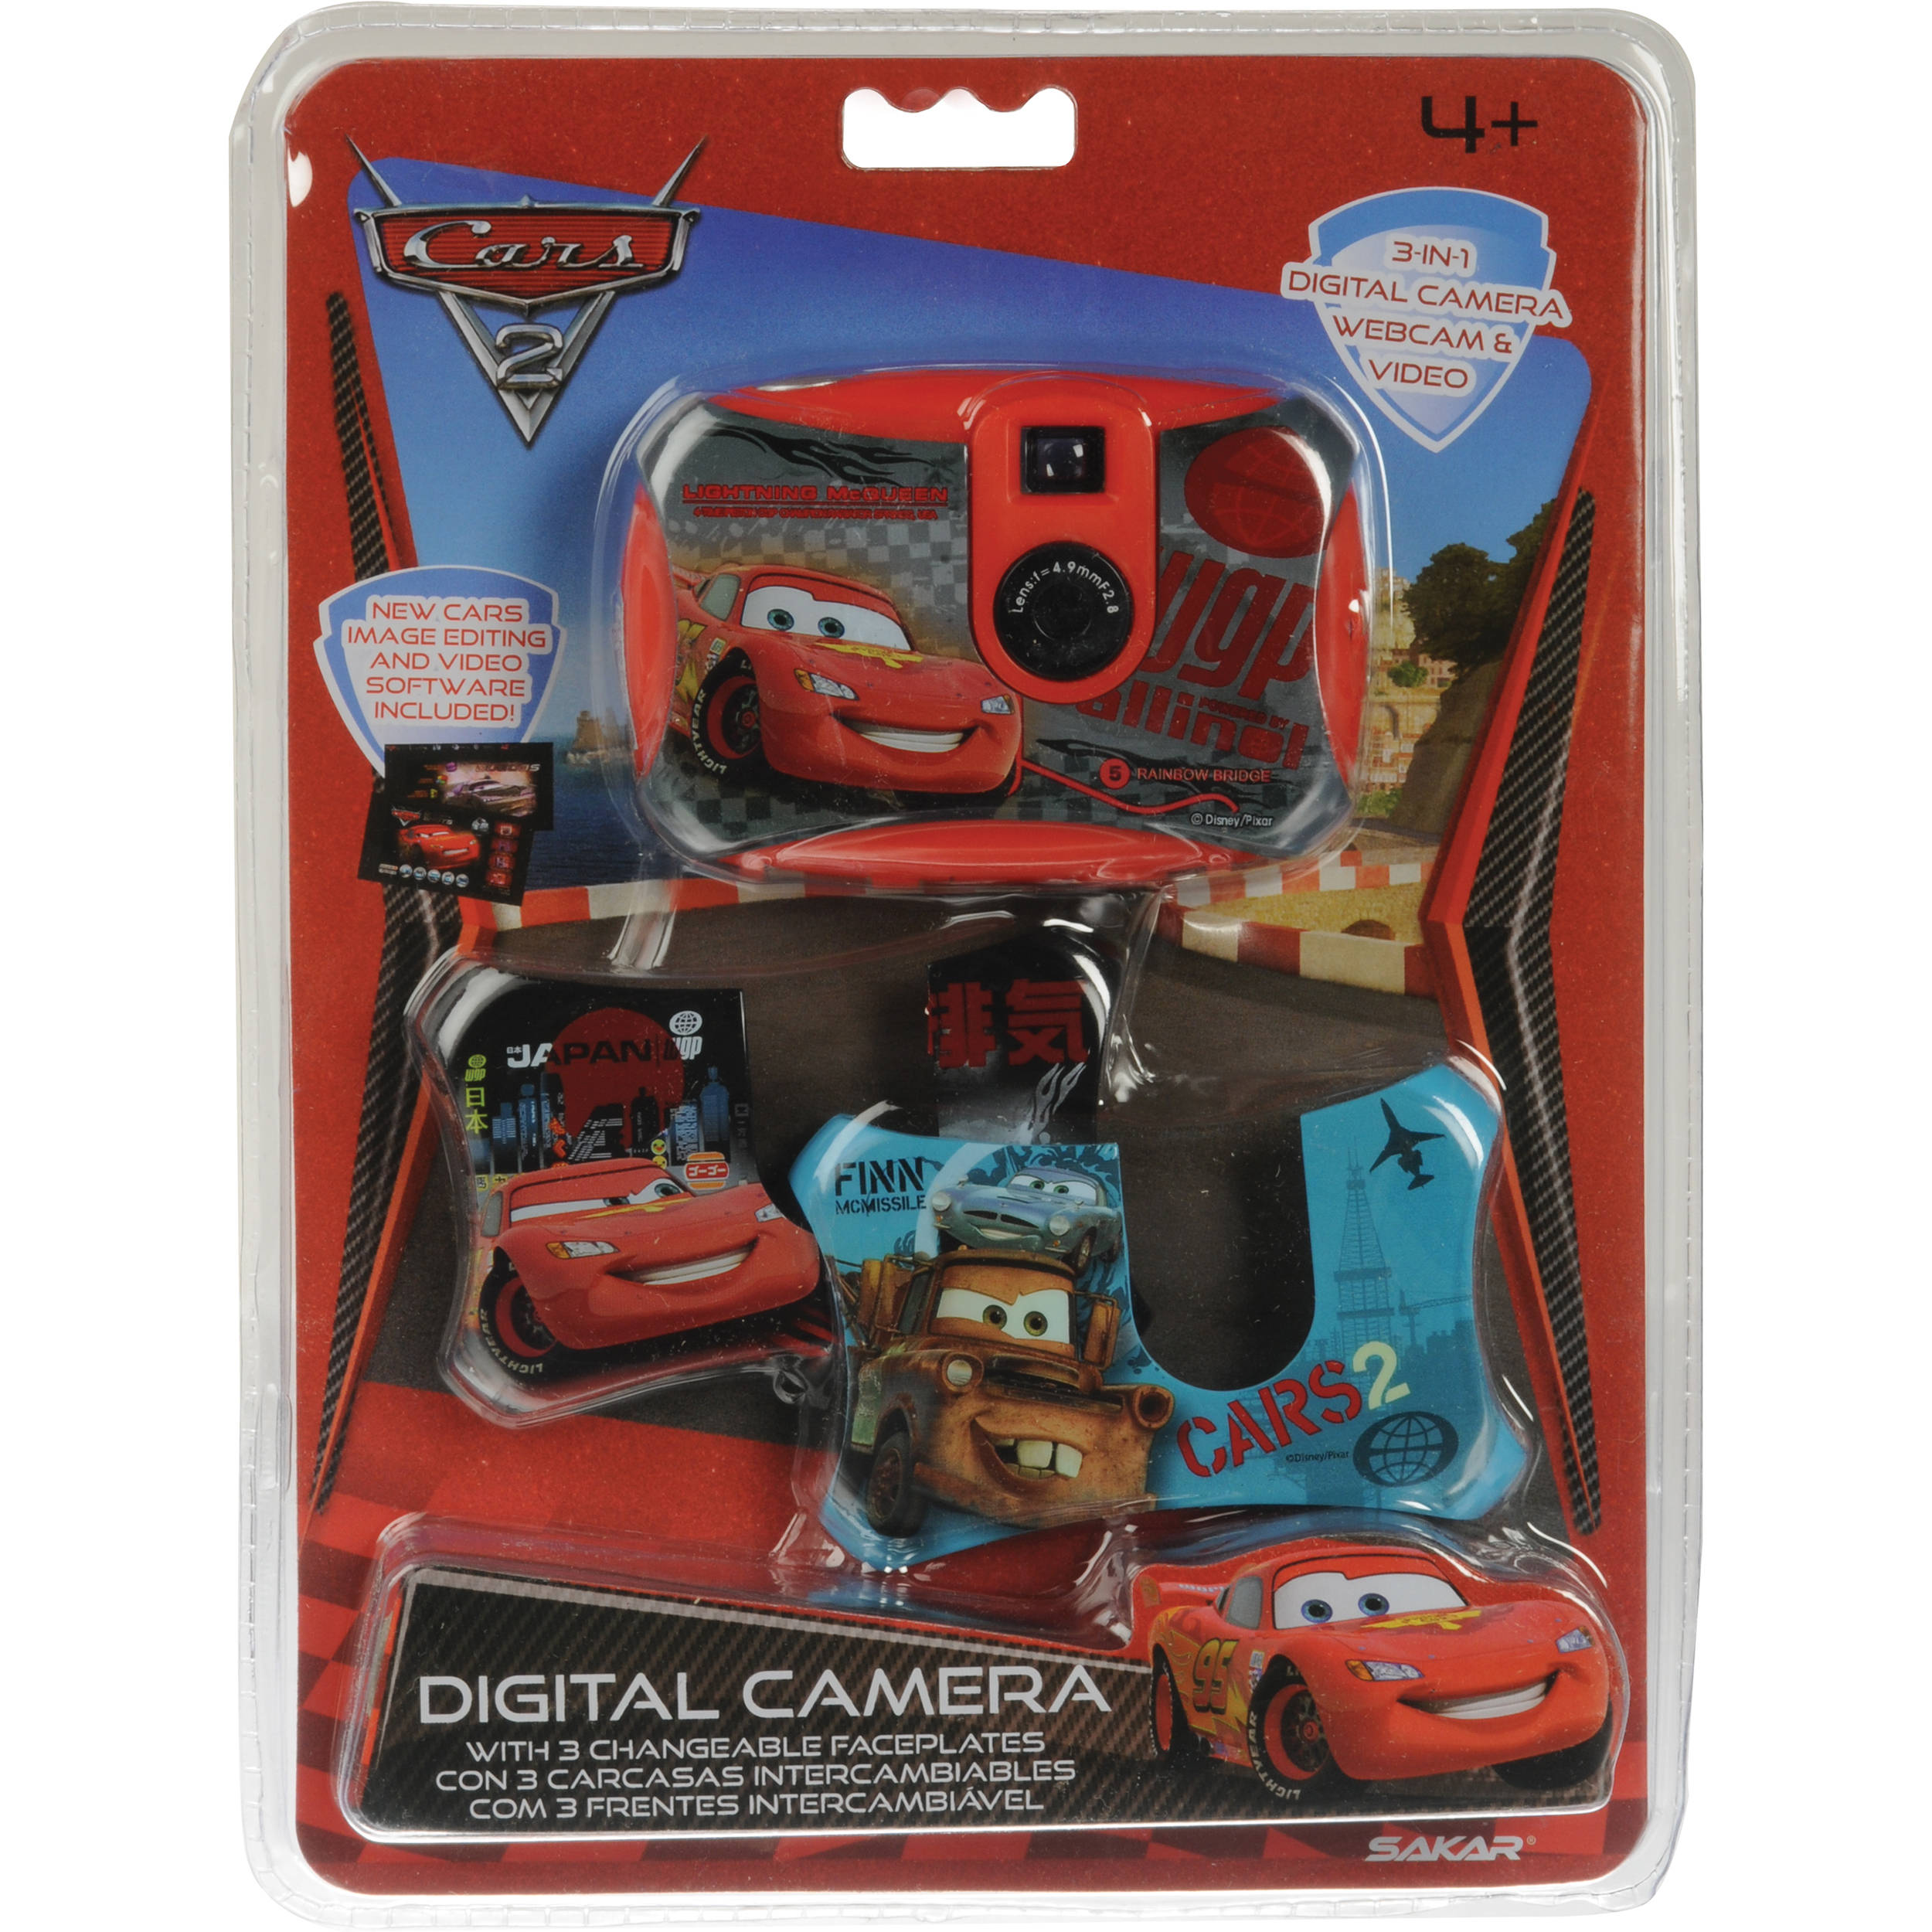 Sakar Cars 2 Digital 3-in-1 Camera with Faceplates